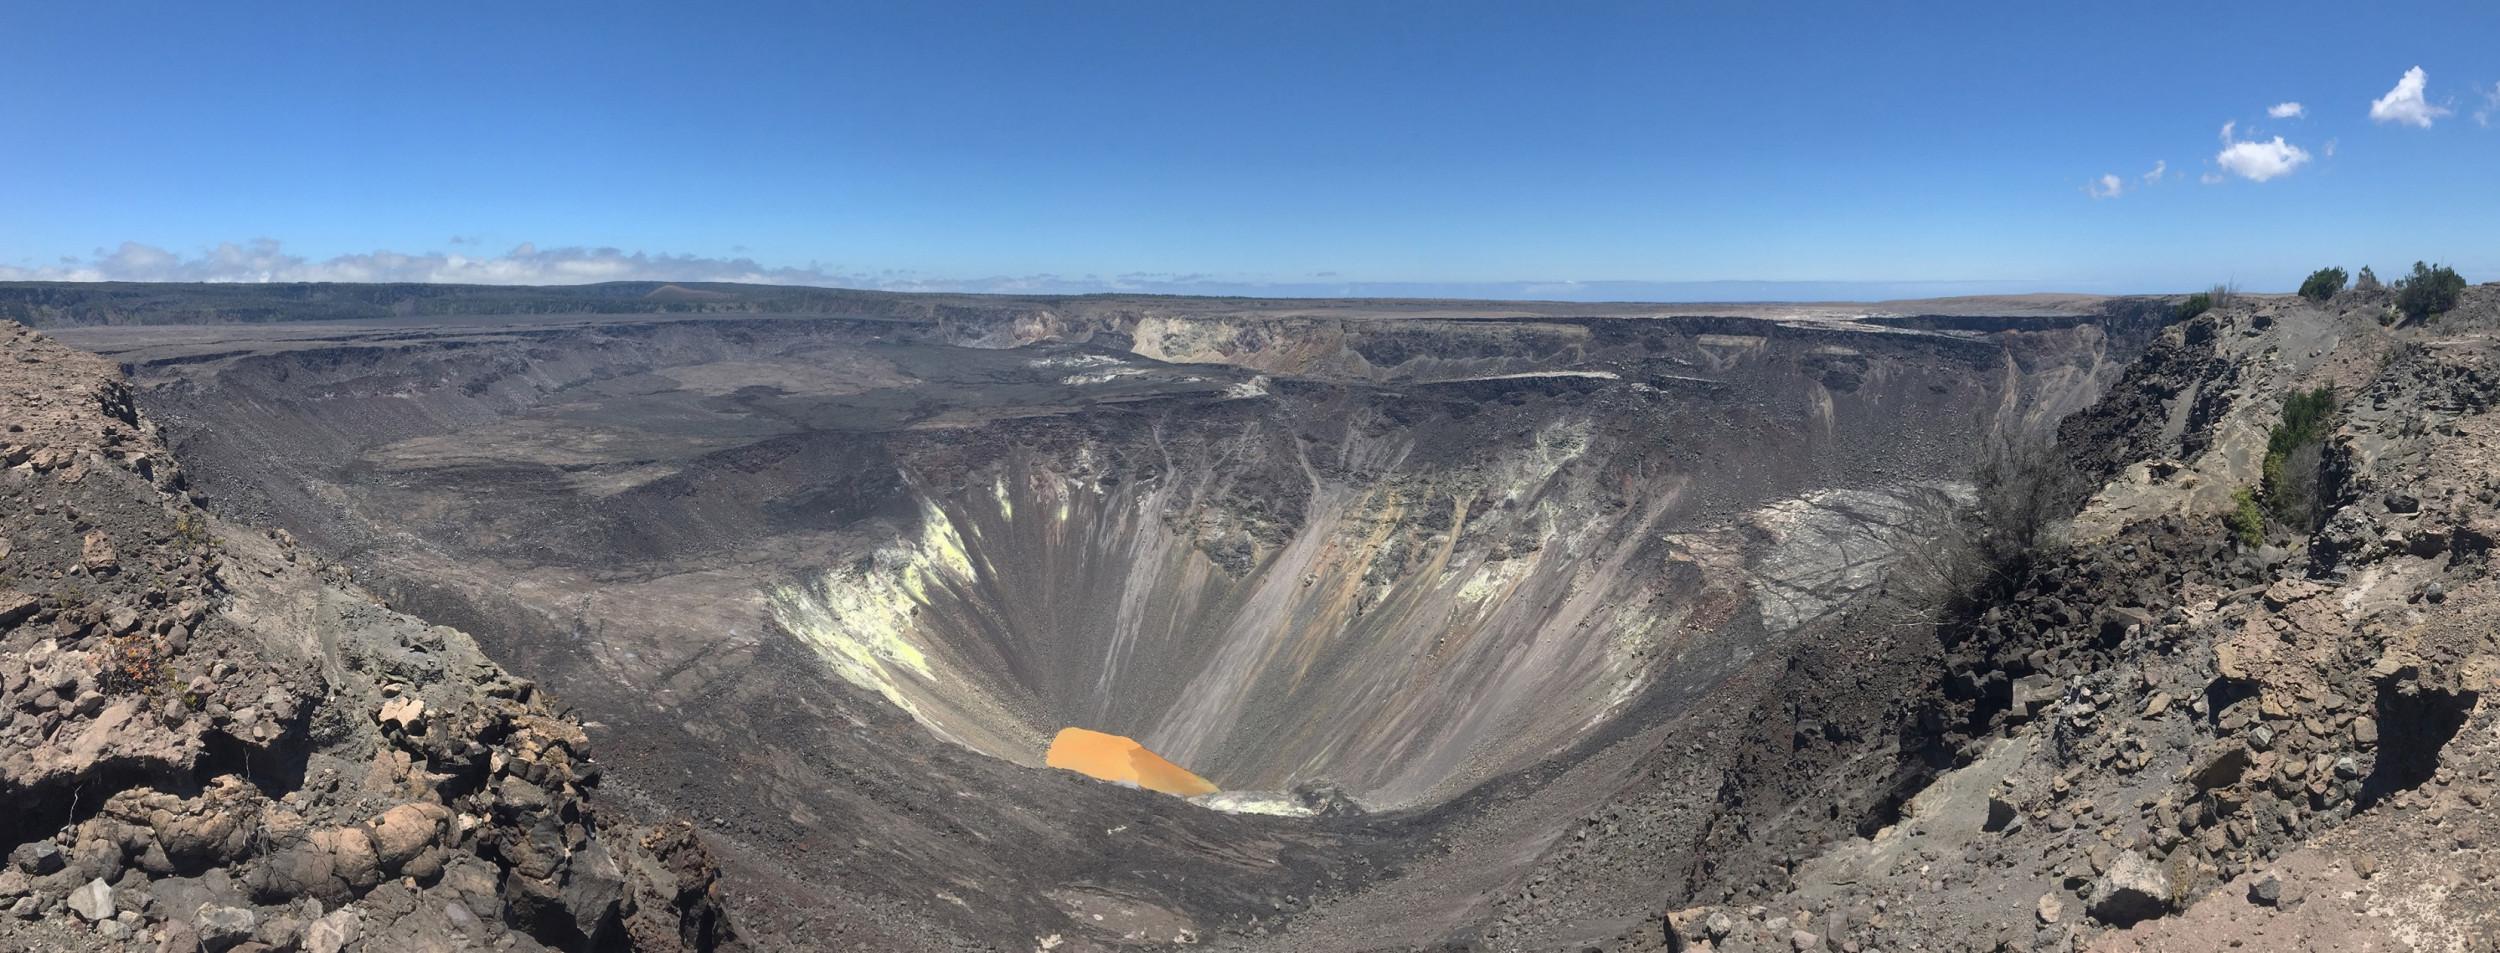 Boiling lake inside Hawaii's Kīlauea volcano is now 130 feet deep